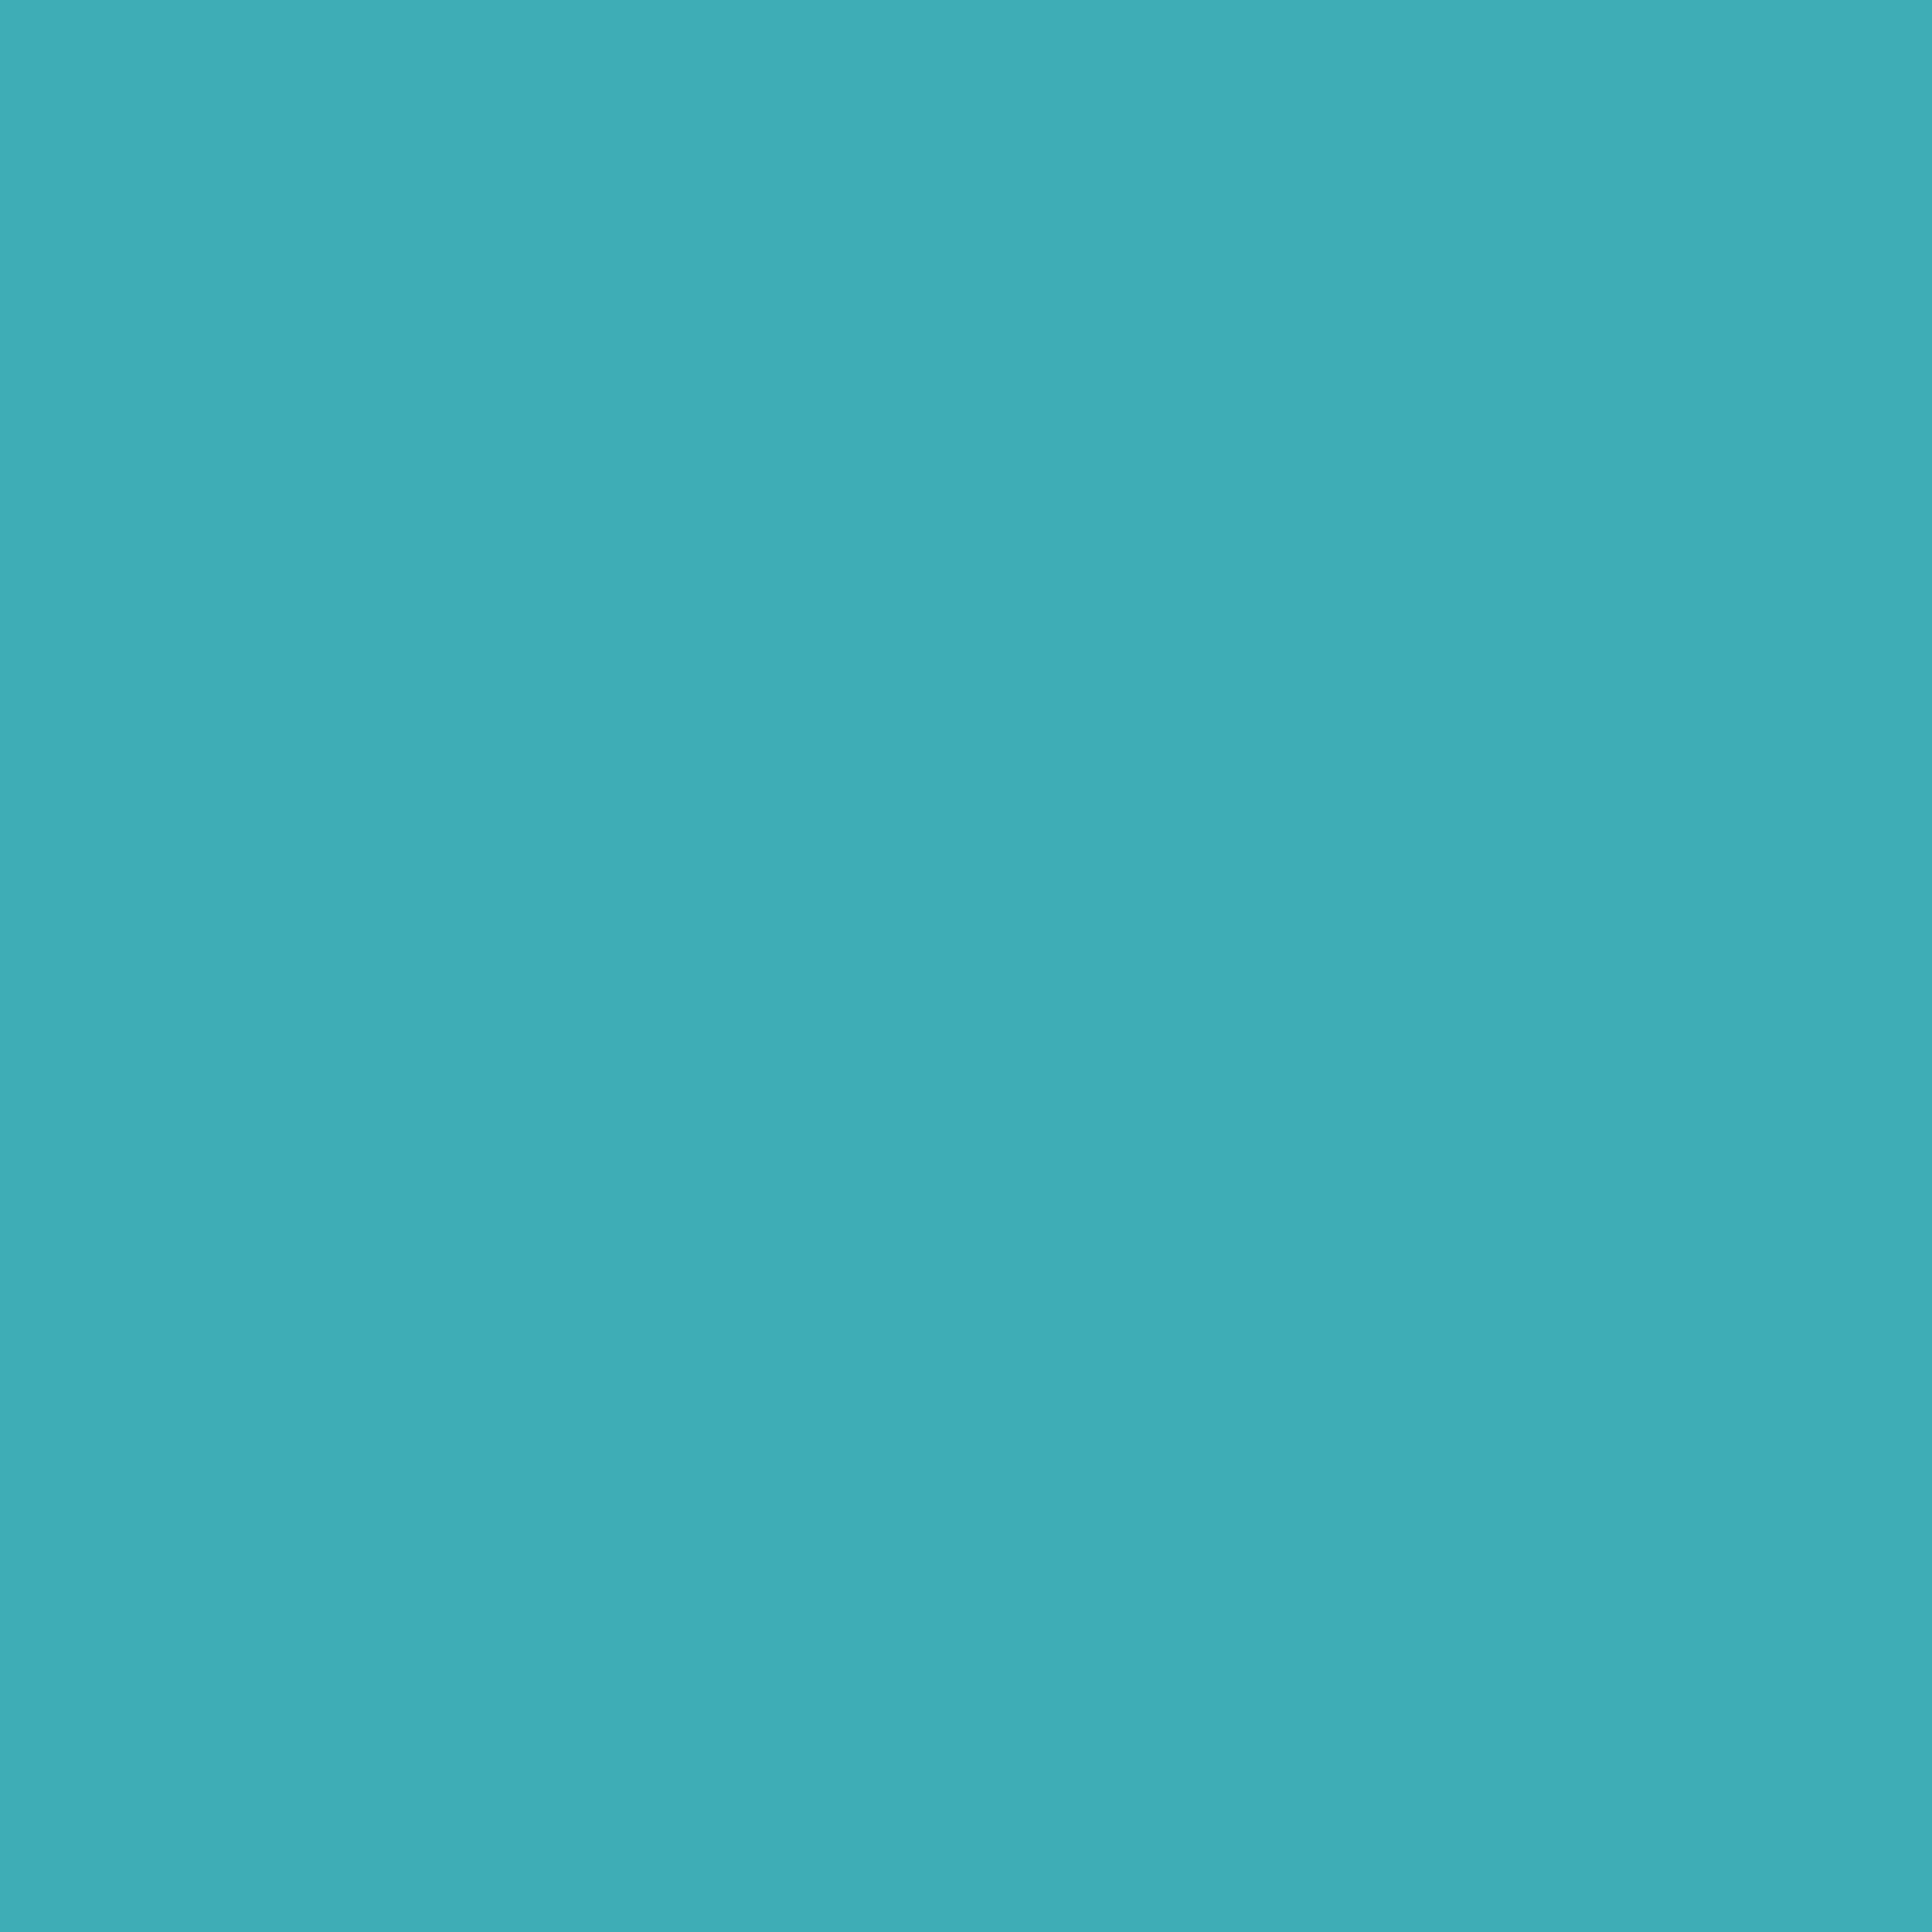 50 linclass dinner napkins aqua blau by wimmel napkins